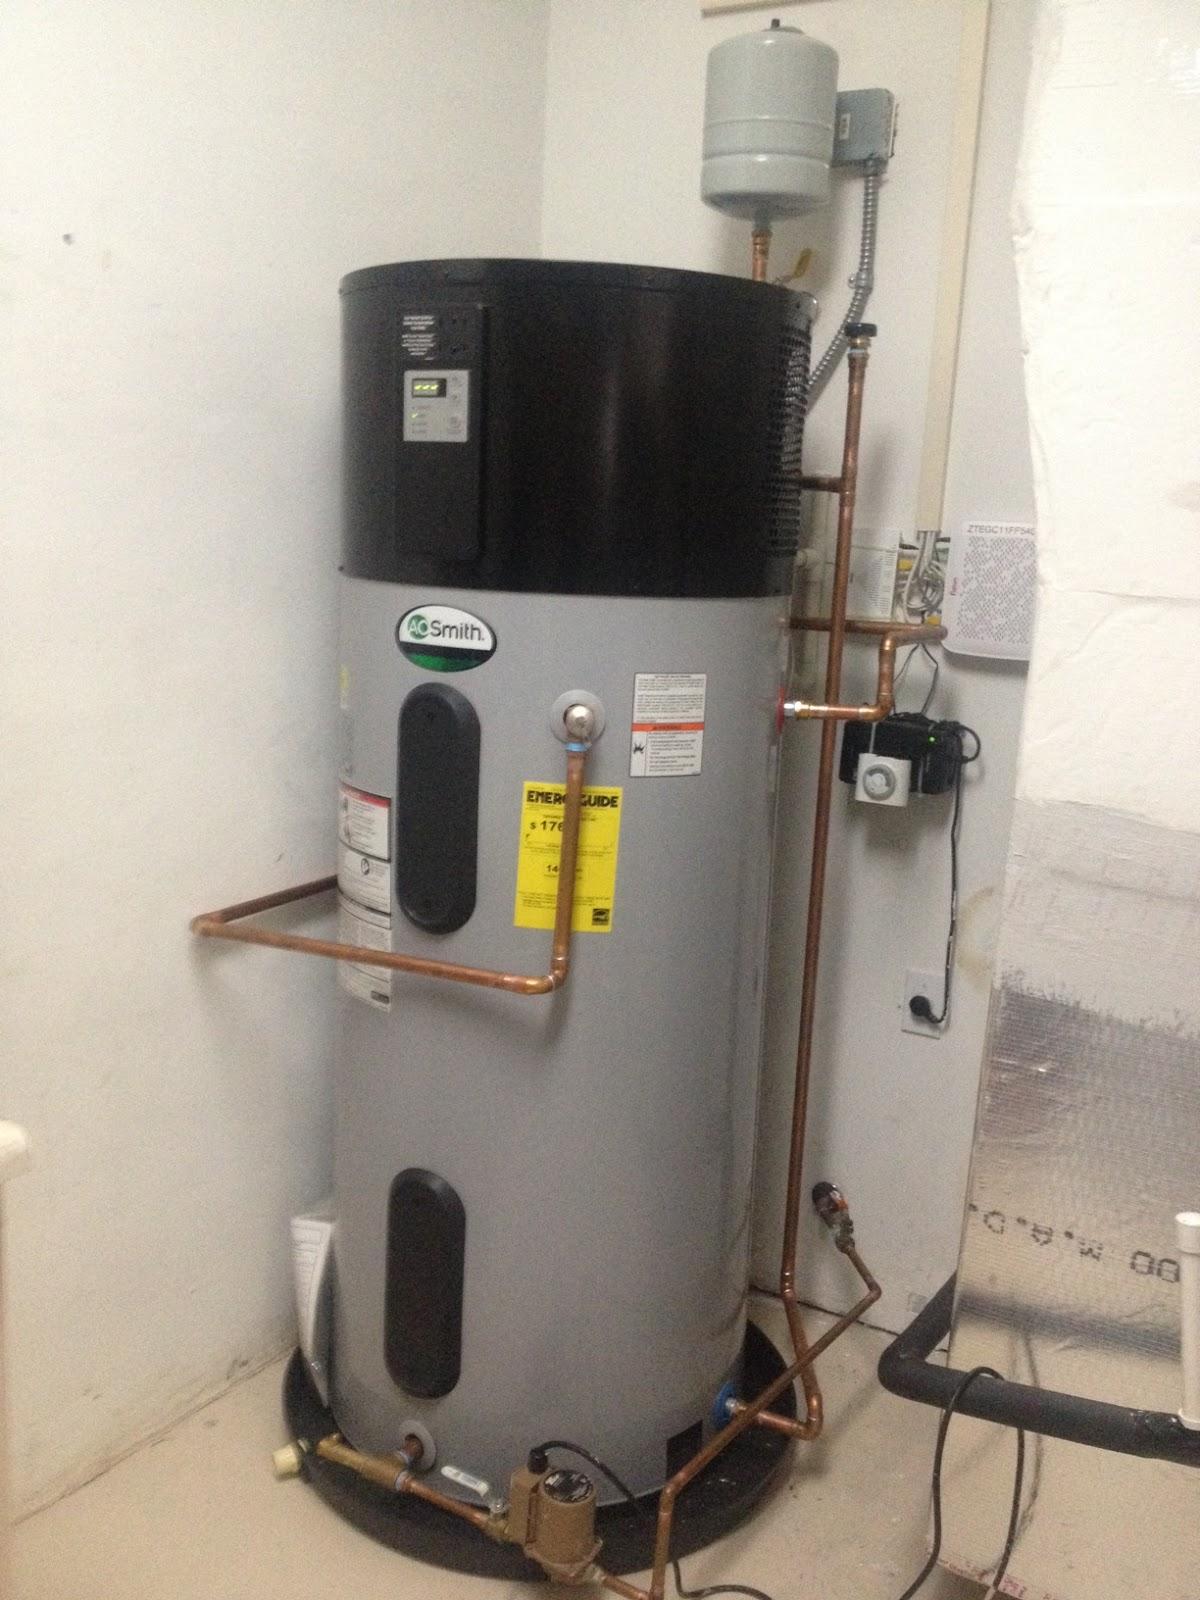 Electric Water Heater Too Hot Facias